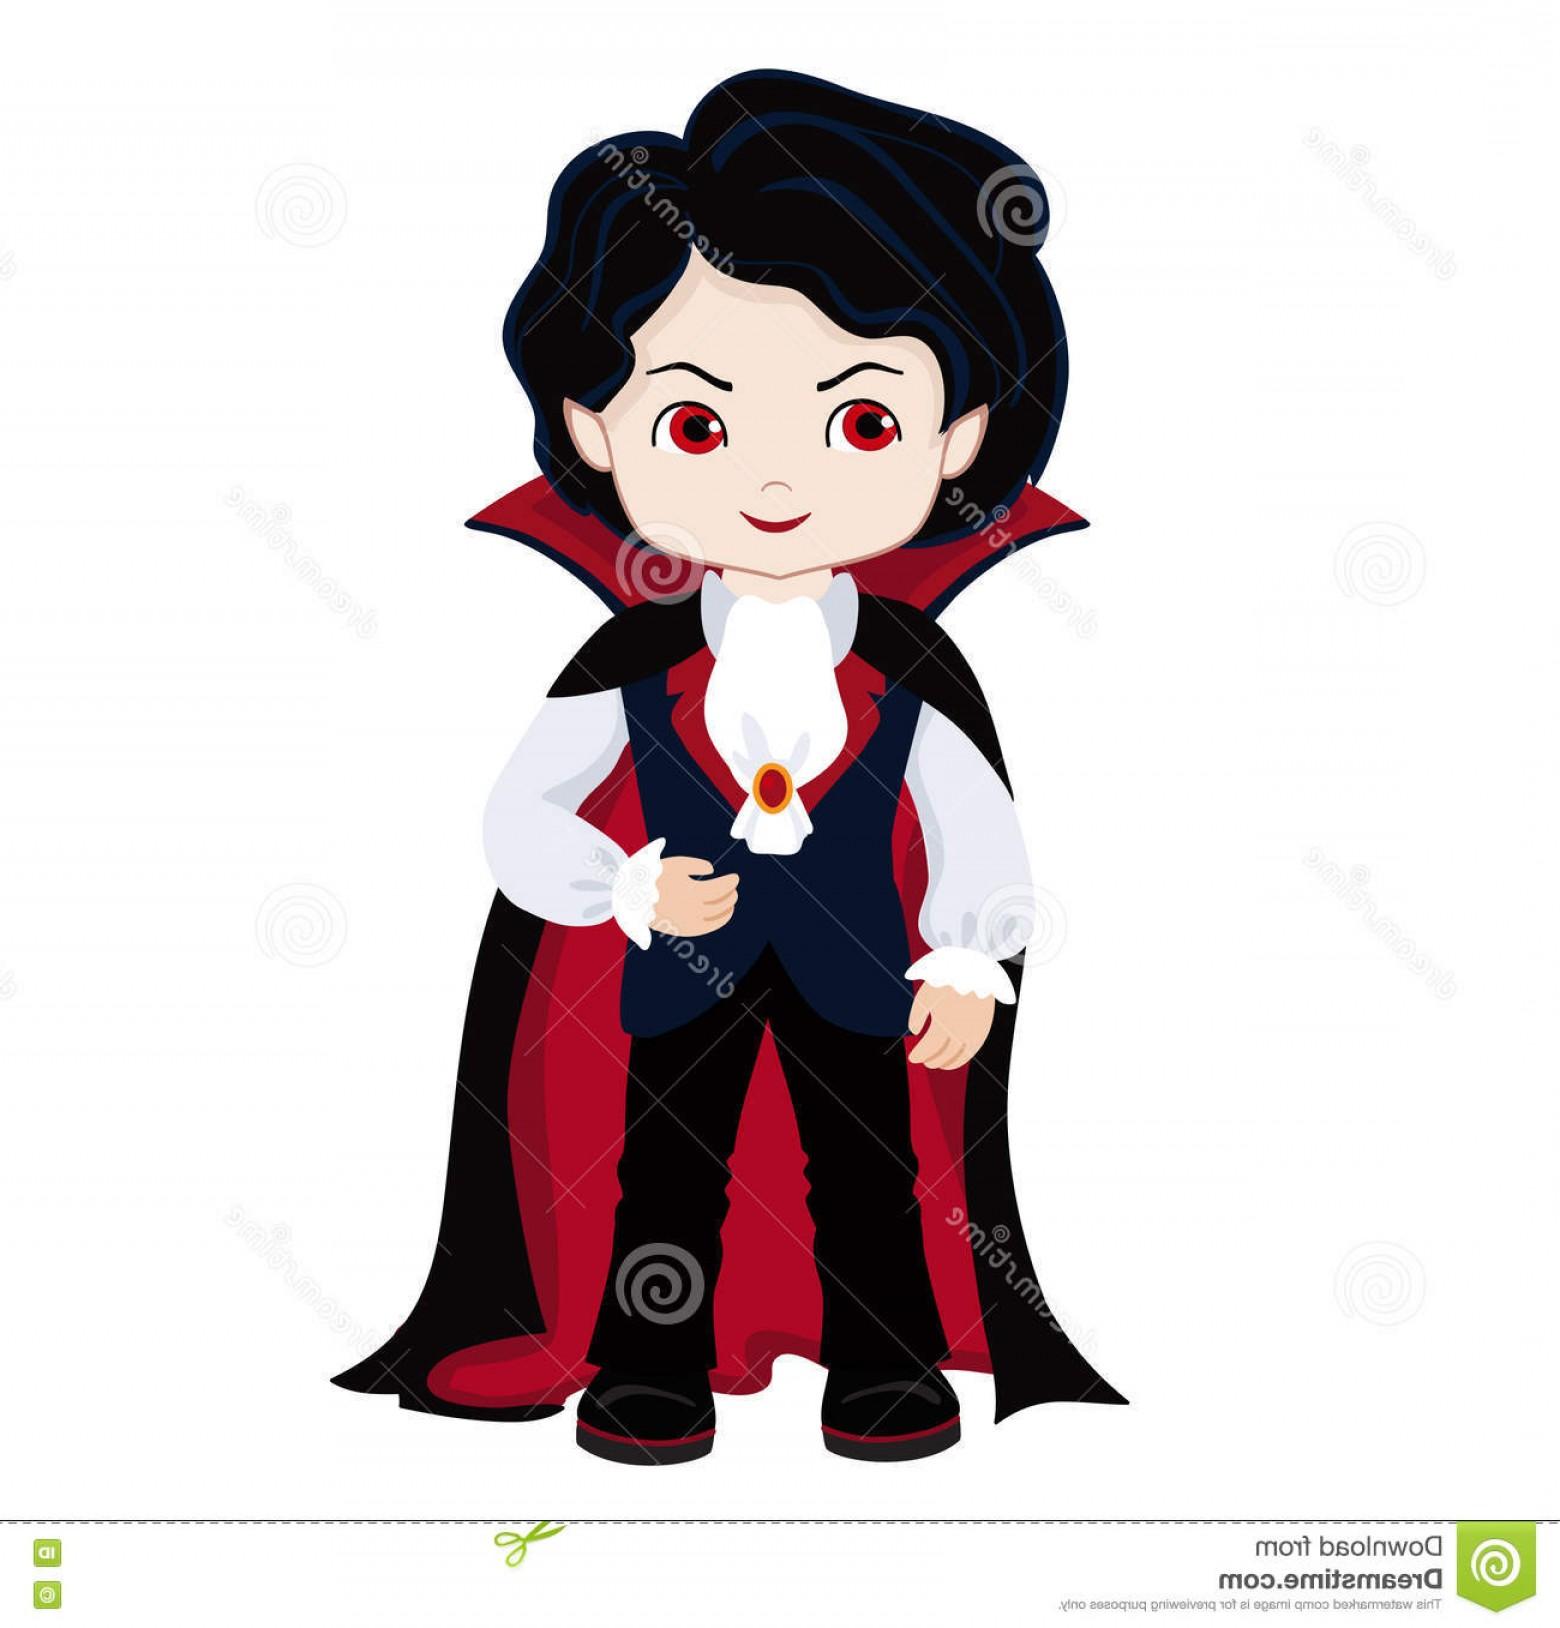 1560x1628 Stock Illustration Funny Cartoon Little Vampire Boy Wearing